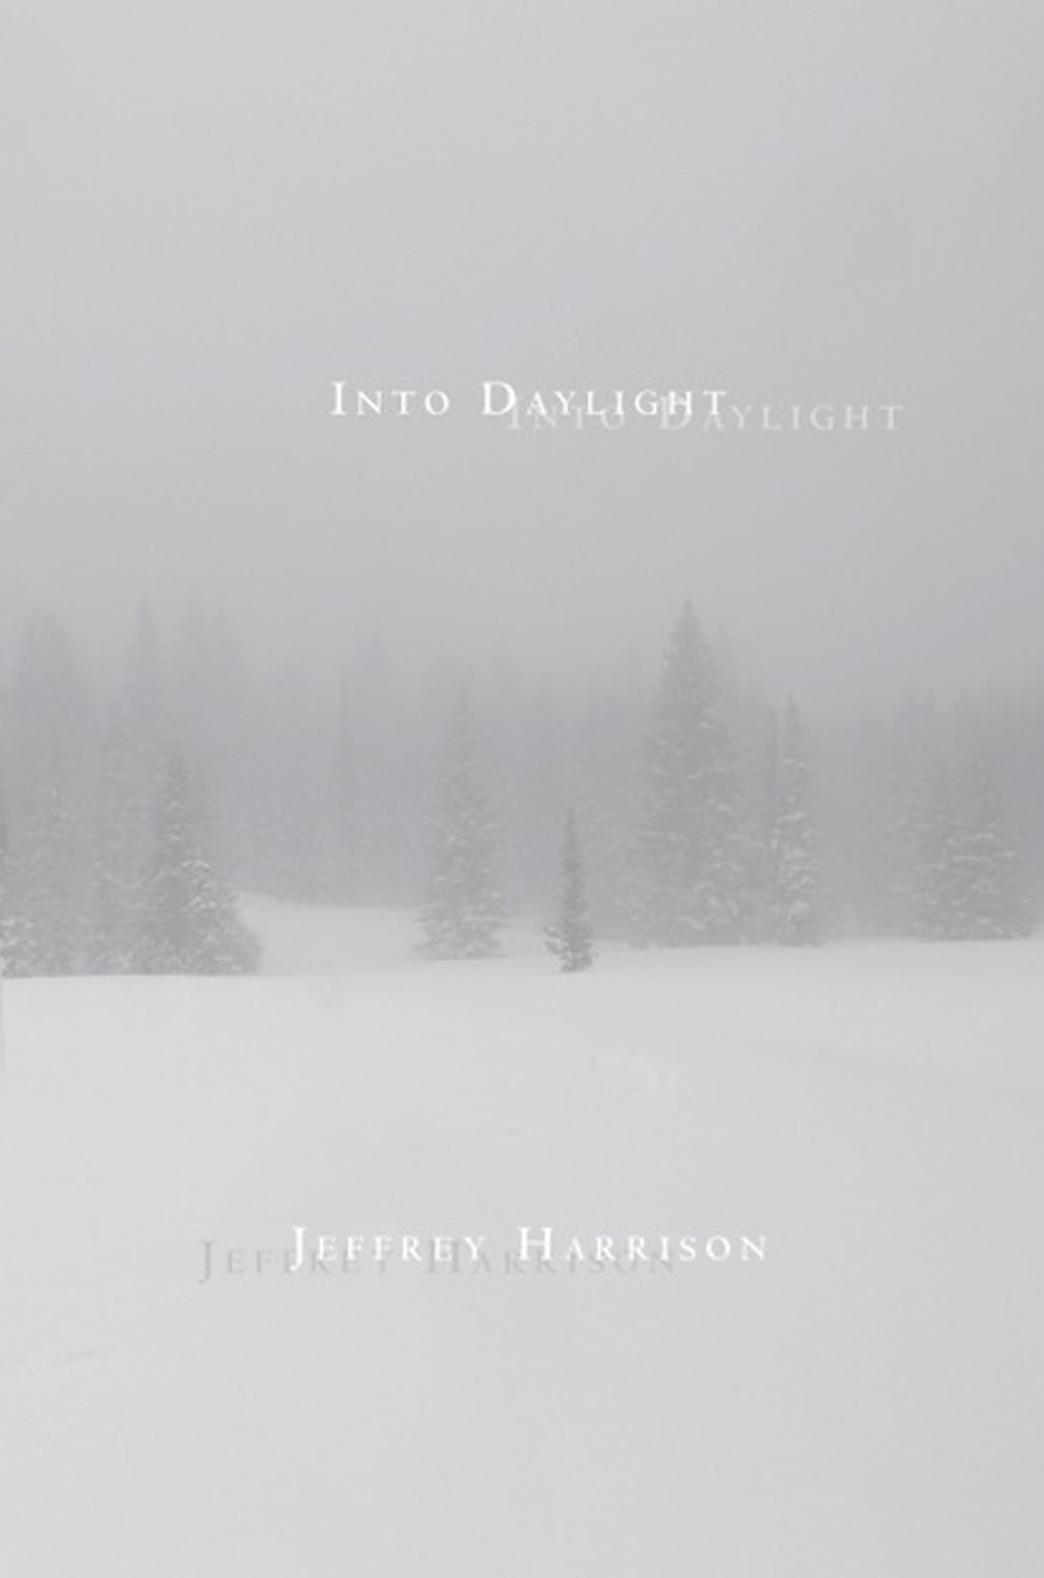 kathleen stone writer booklab literary salon into daylight jeffrey harrison